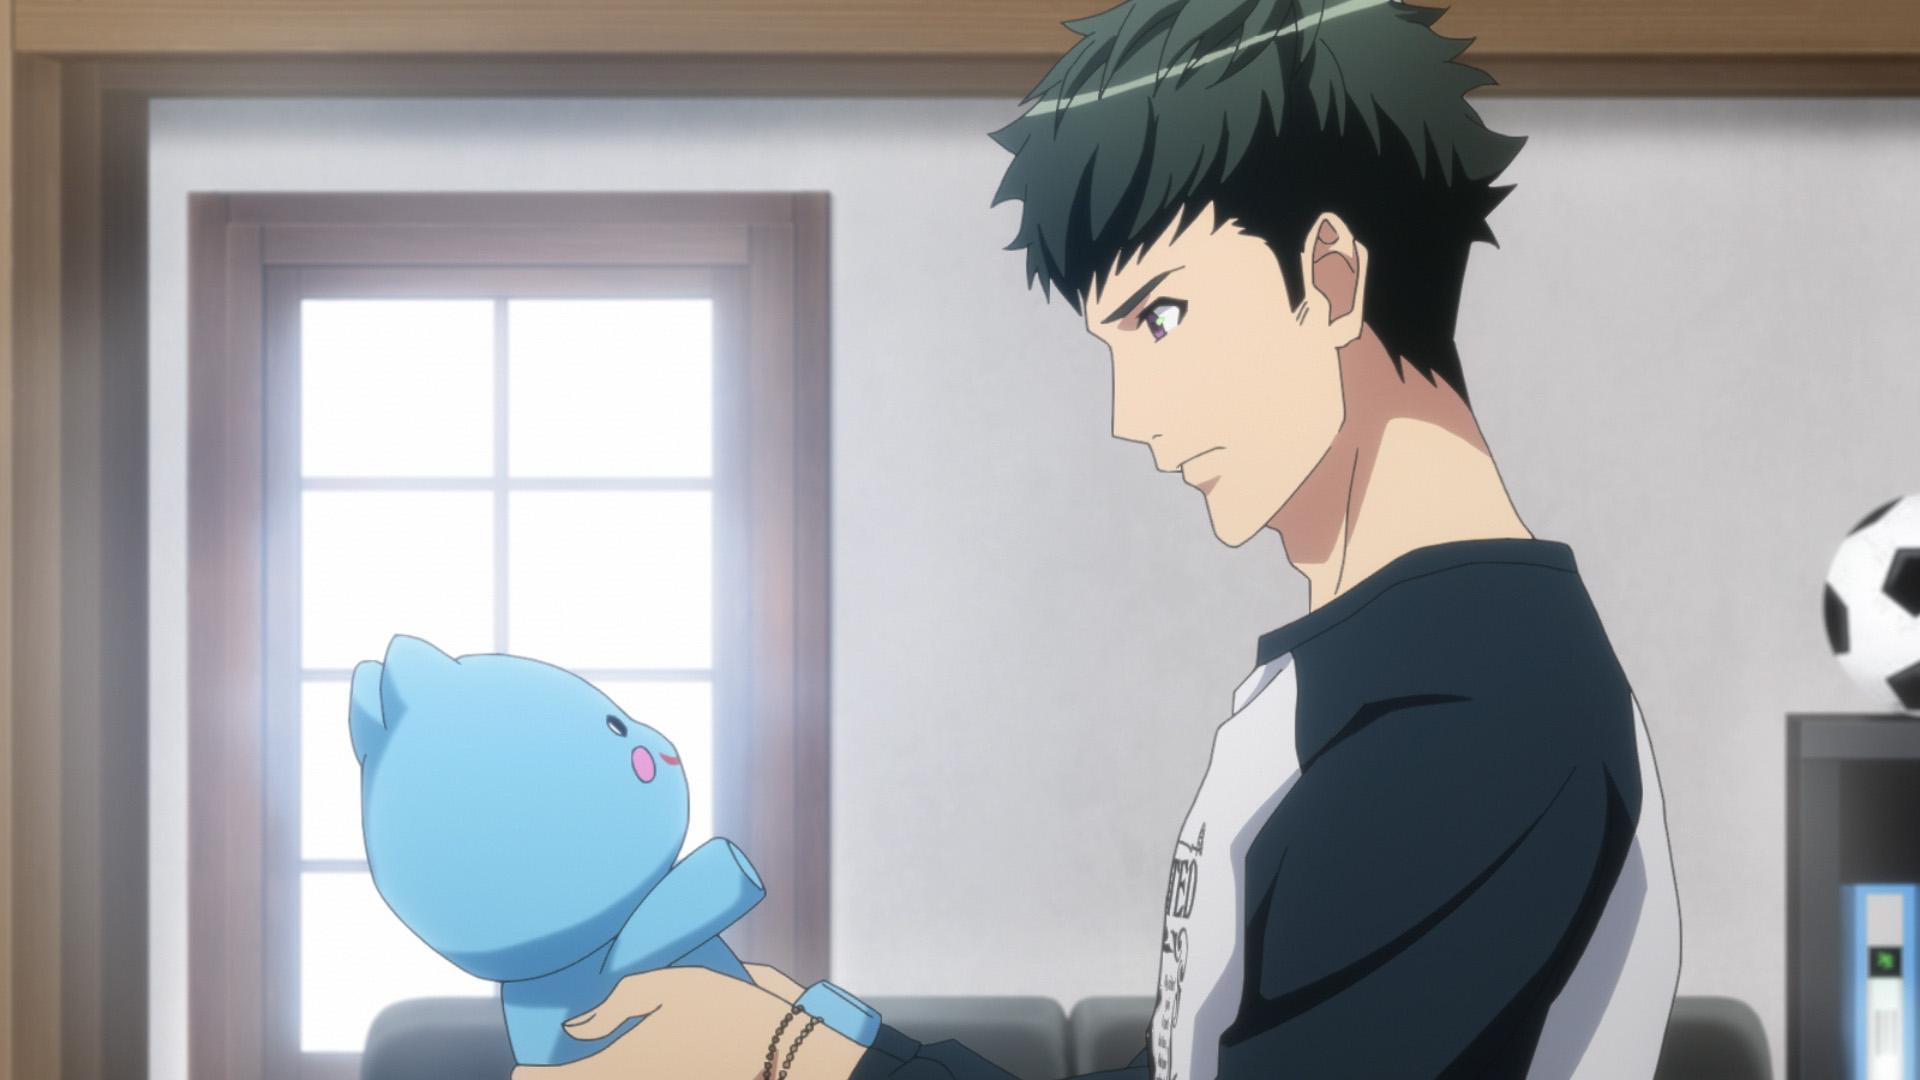 TVアニメ「A3!」第20話「責任と覚悟」先行カット